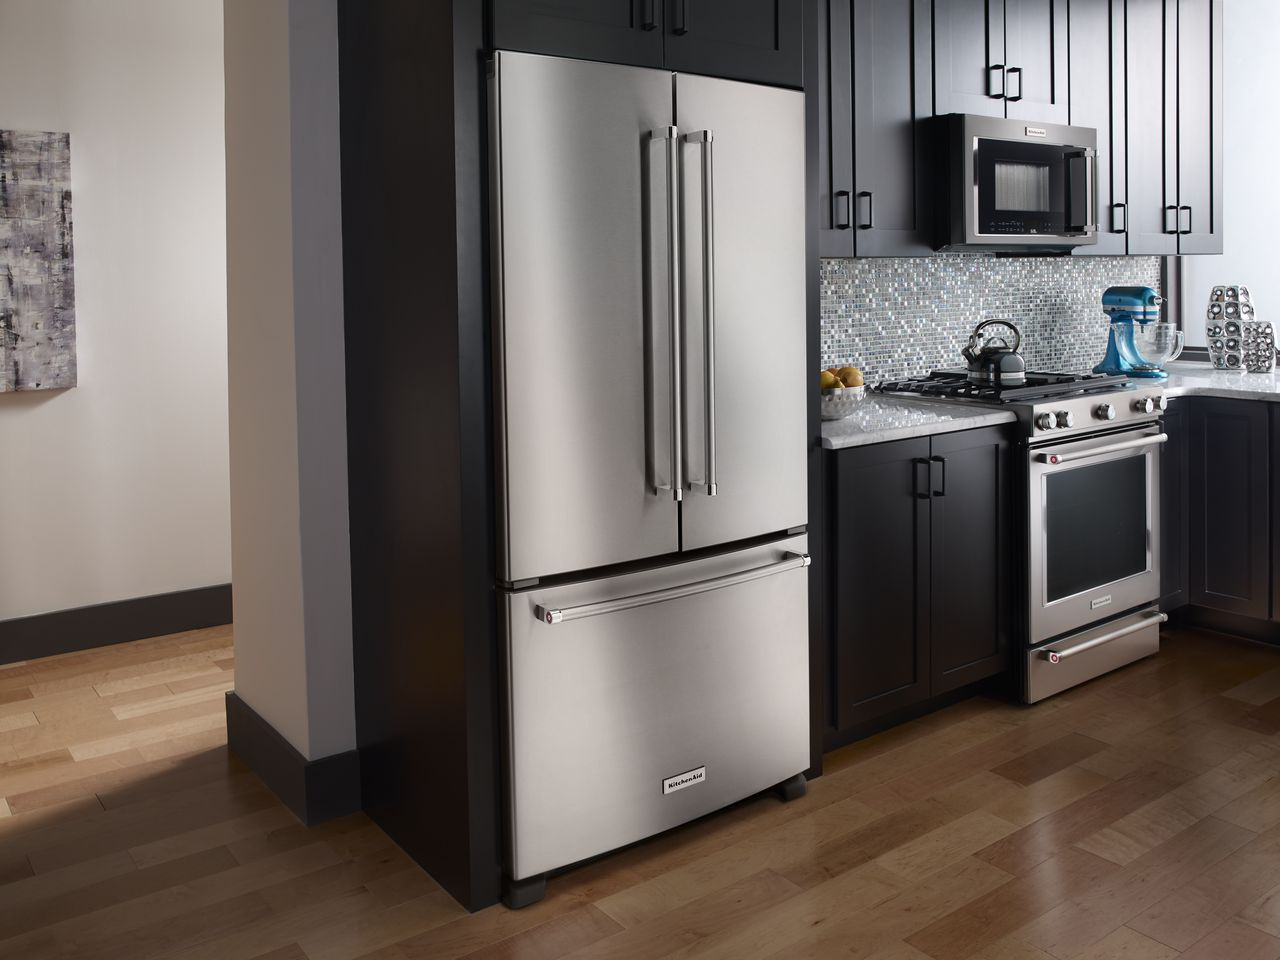 Kitchenaid Superba Dishwasher Operating Manual - Kitchen Design ...